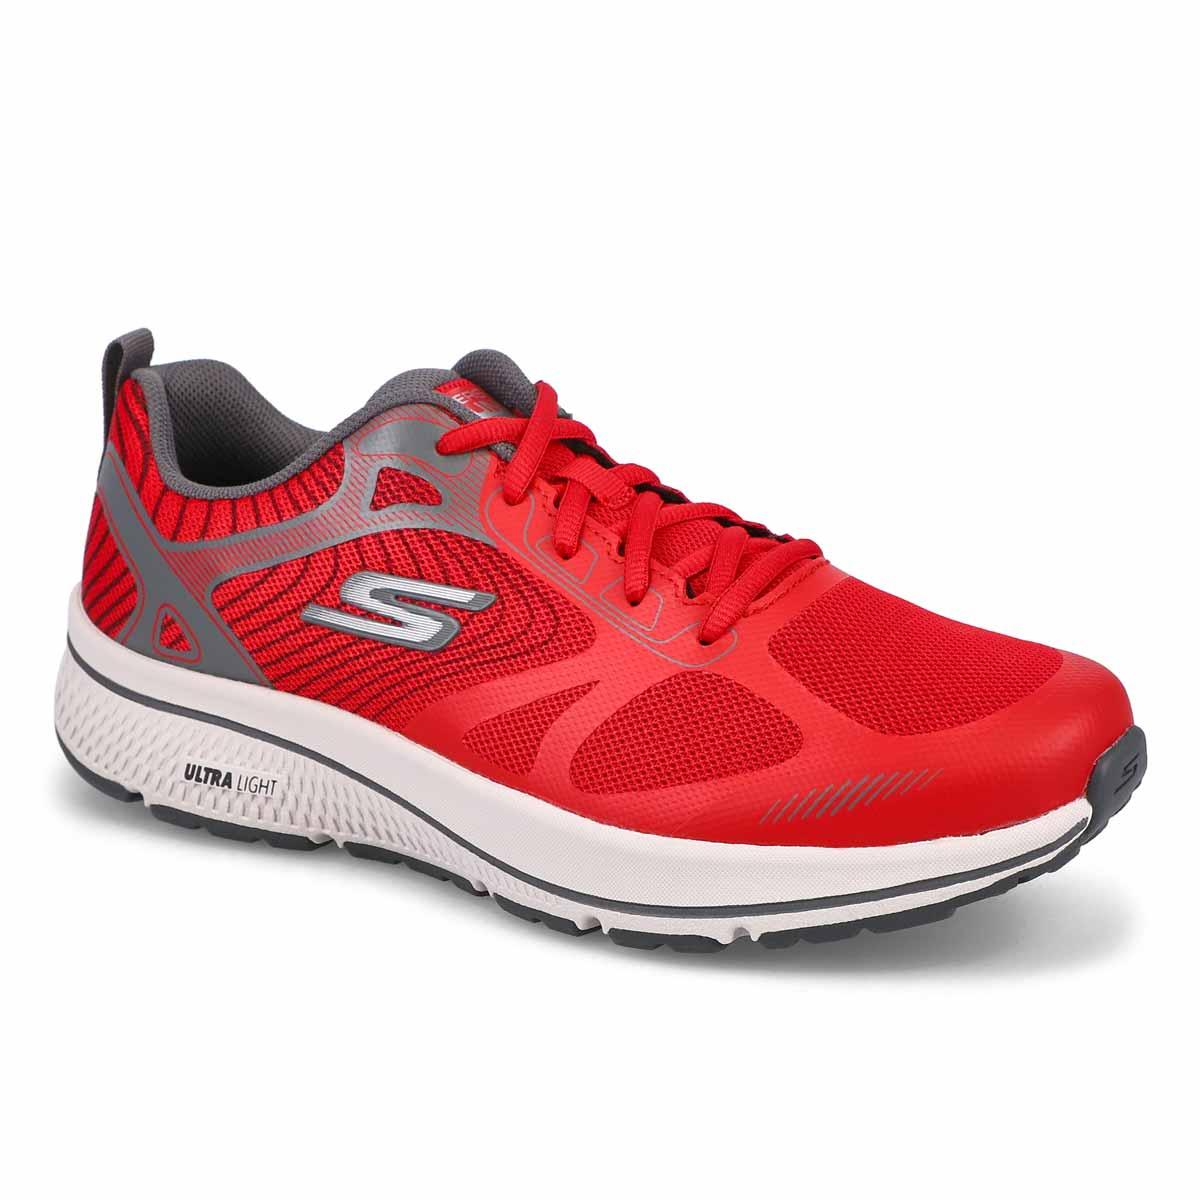 Men's Go Run Running Shoes - Red